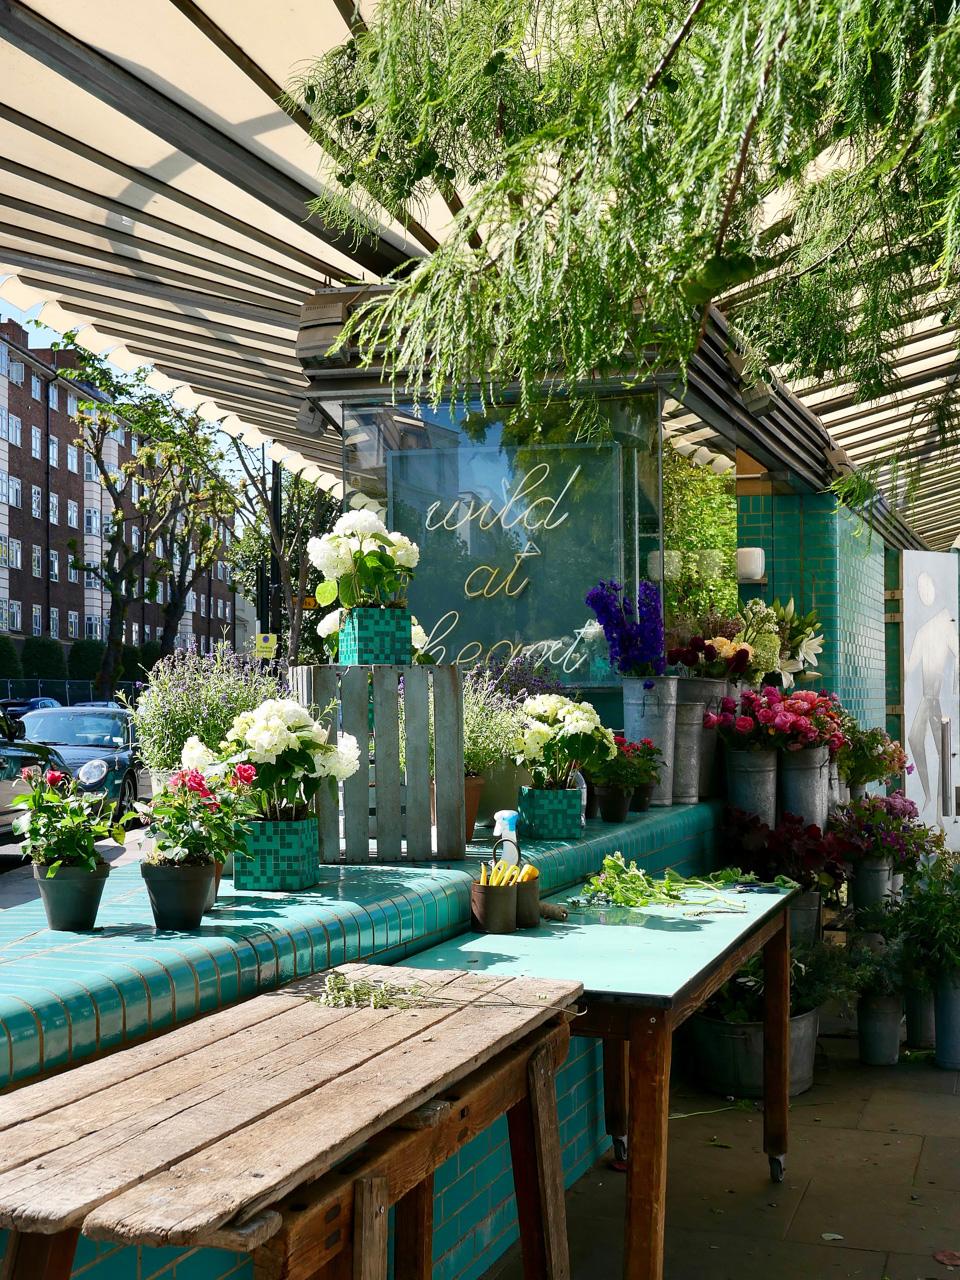 Cara Sharratt Travel - Flower shop in Notting Hill - London, England